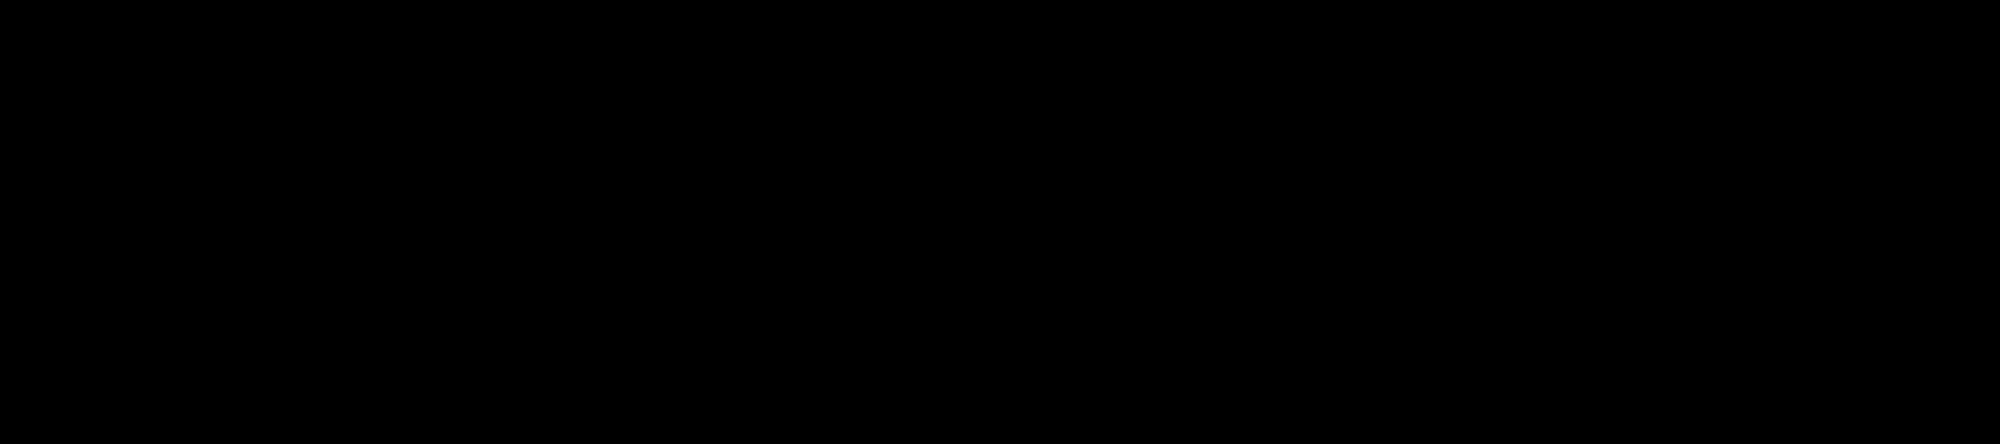 2000px-Man_Ray_signature